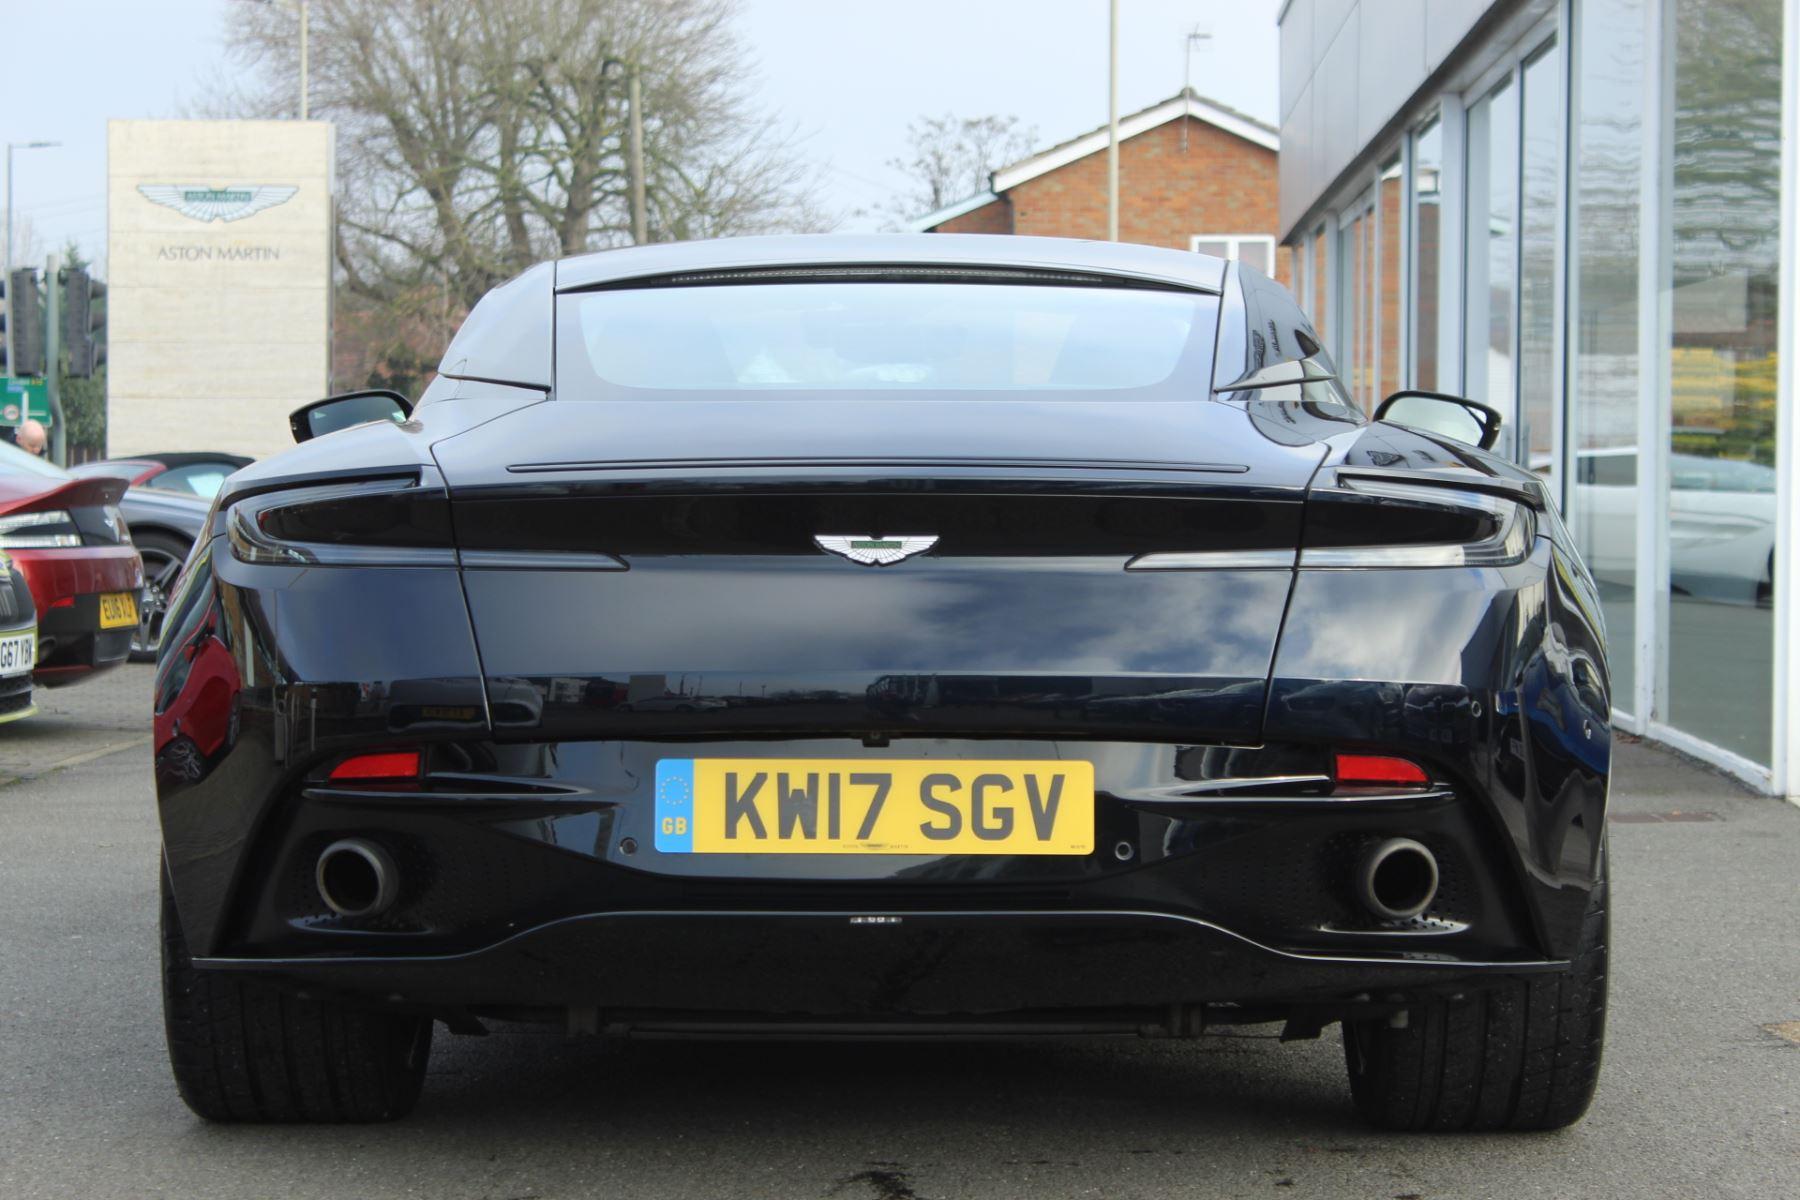 Aston Martin DB11 V12 2dr Touchtronic image 8